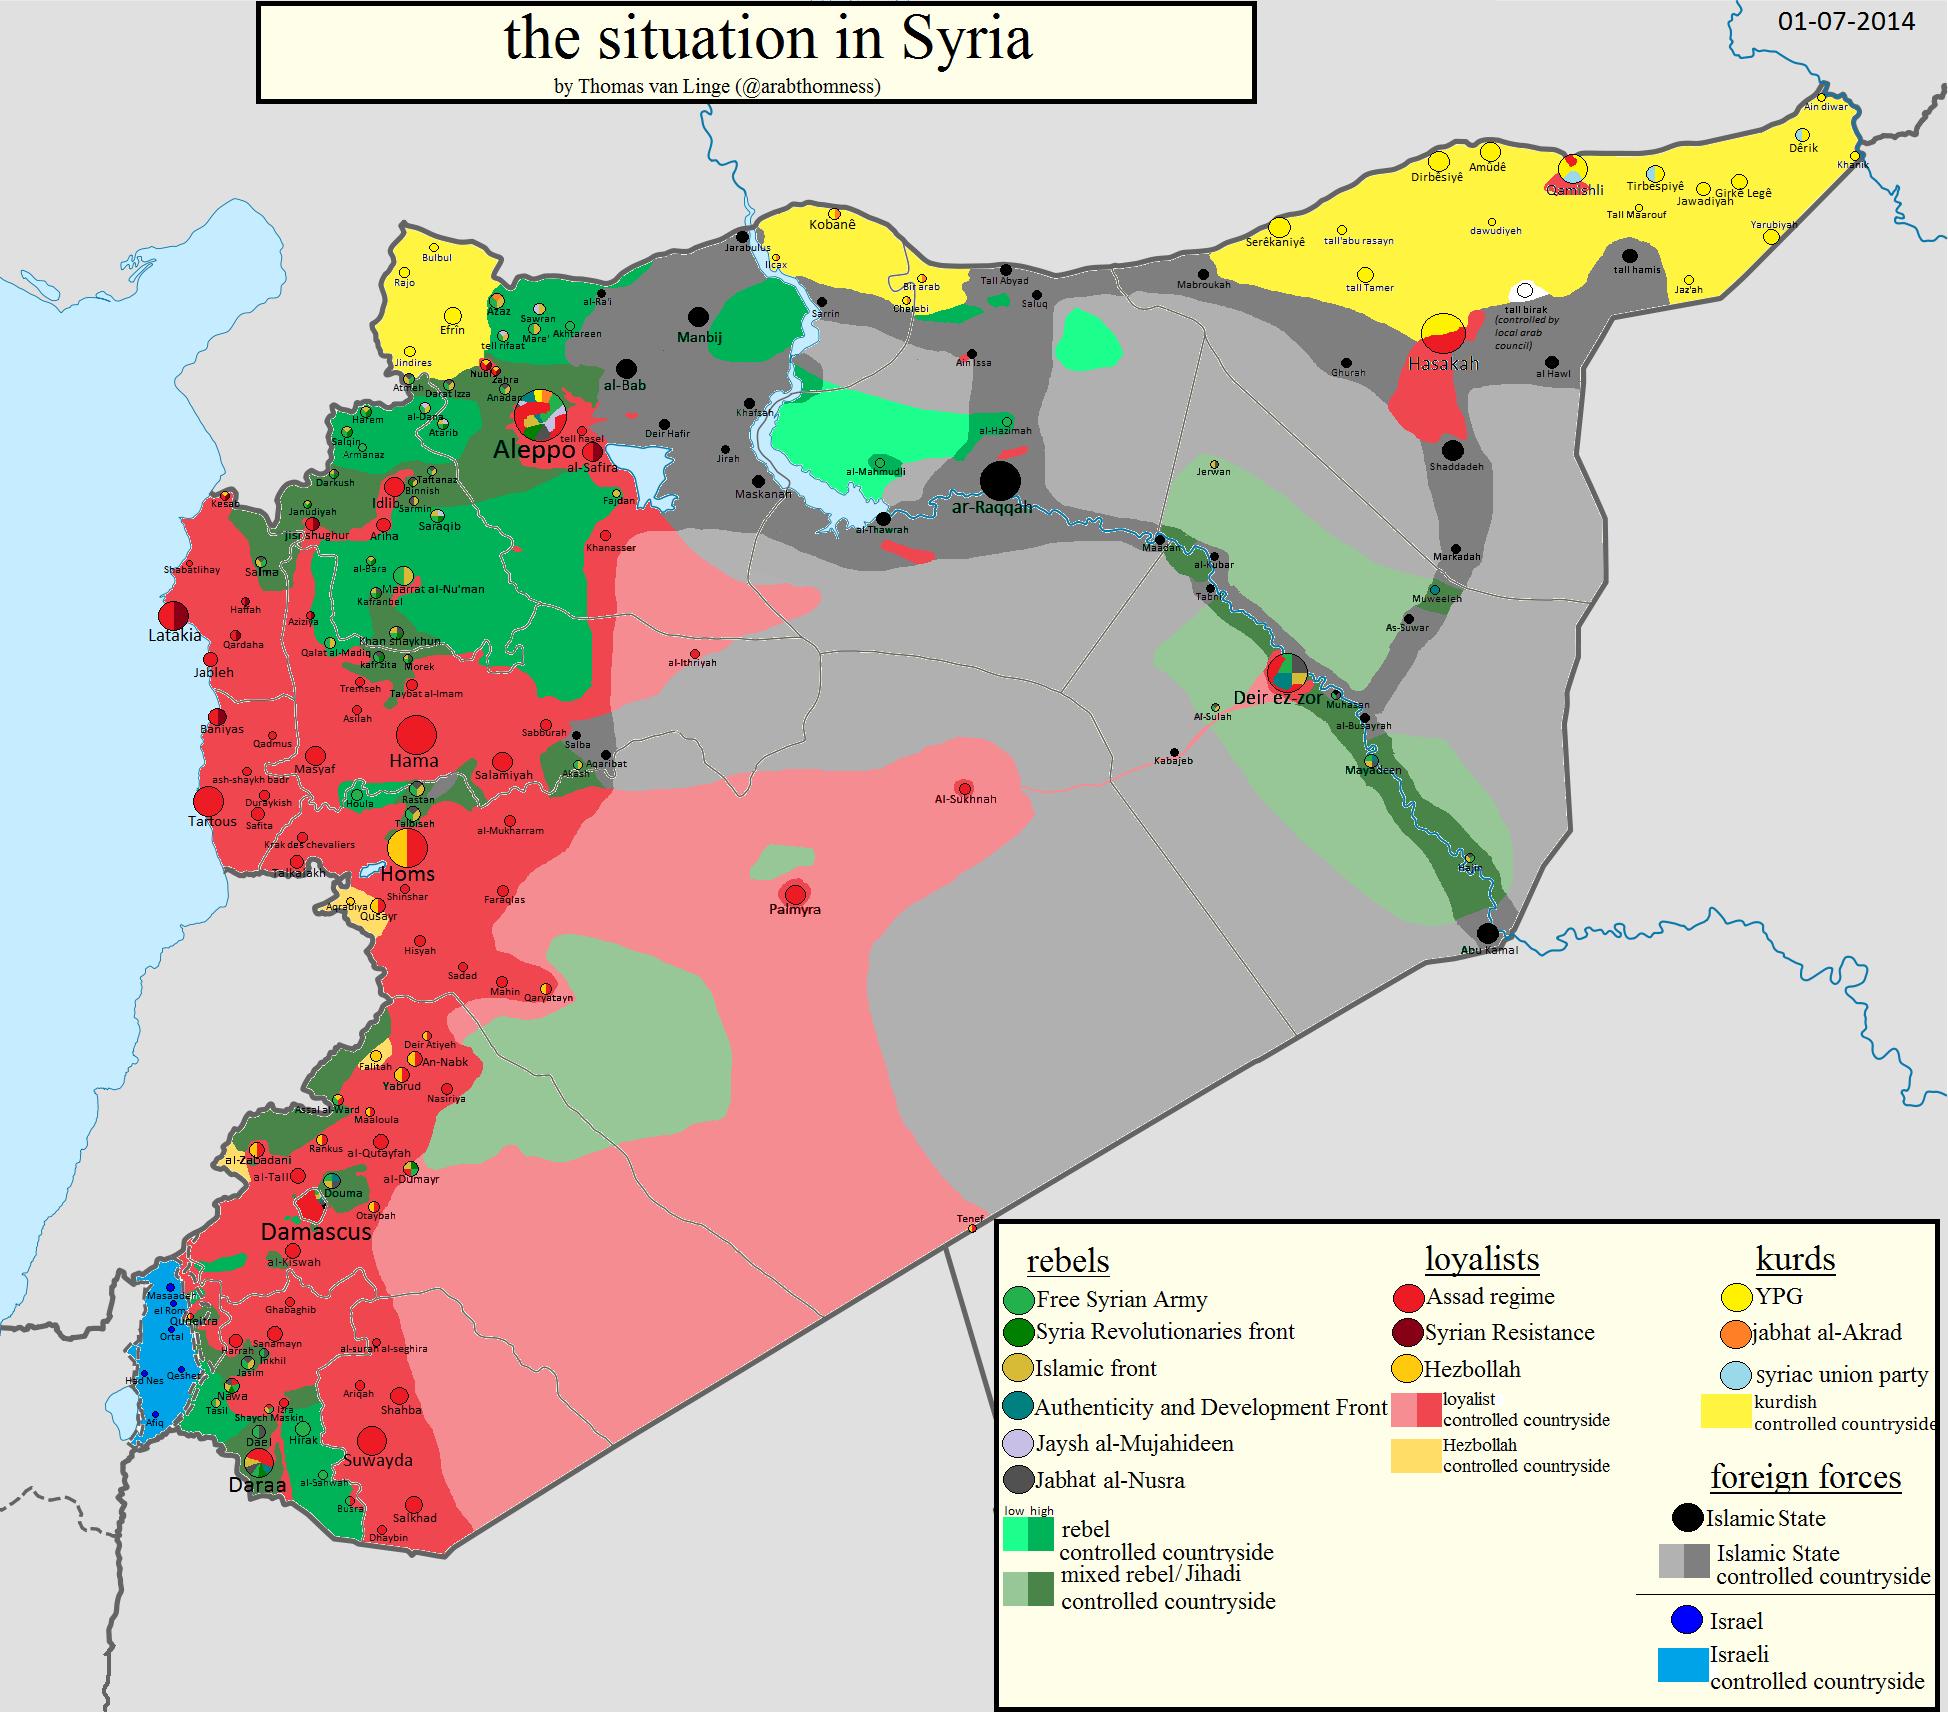 http://www.les-crises.fr/wp-content/uploads/2015/10/23-syrie-07-2014.png